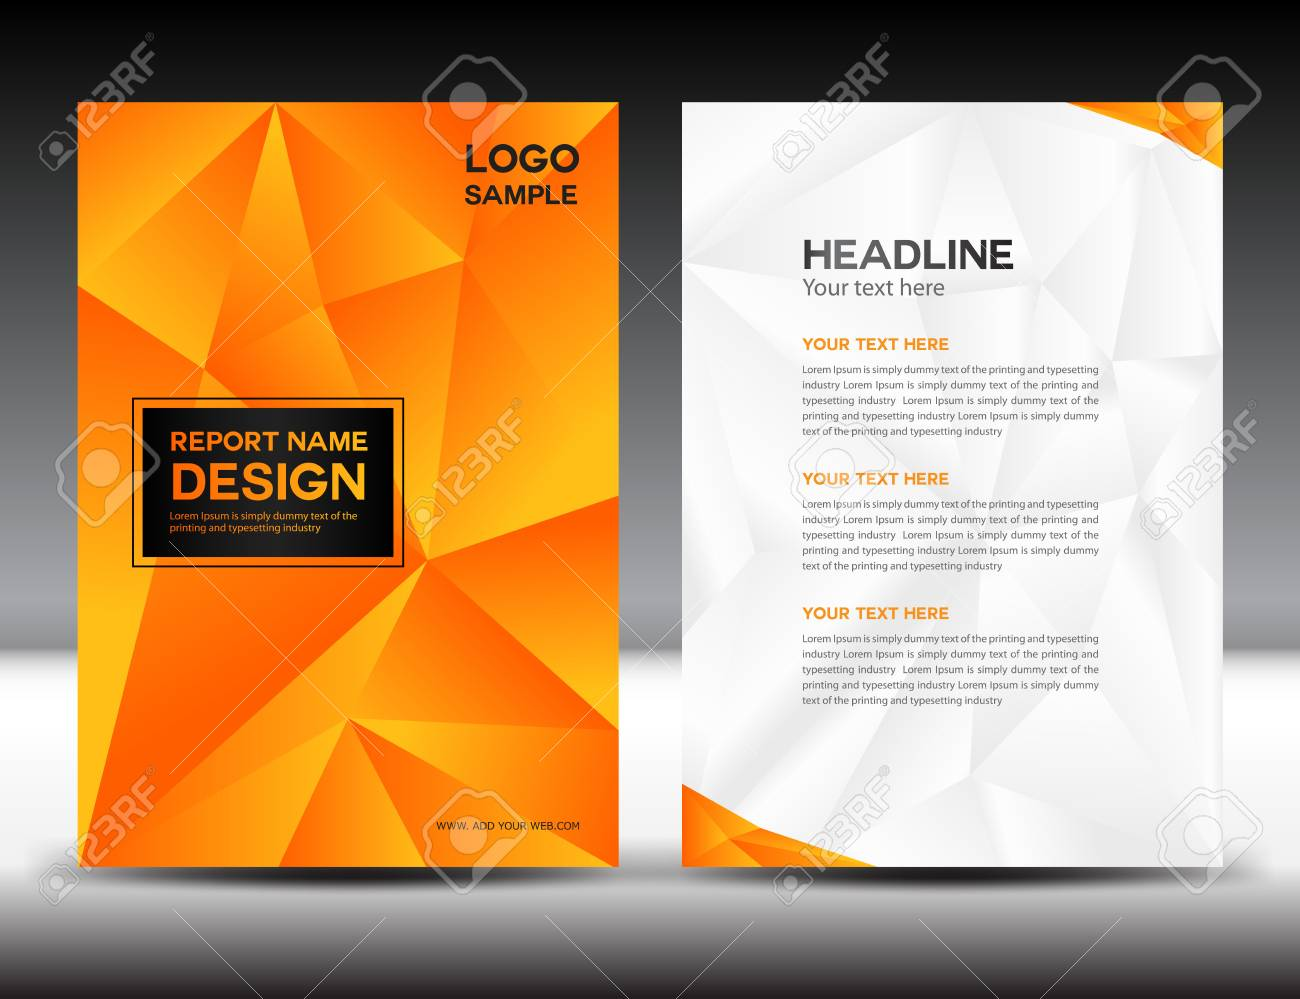 annual report template design – Annual Report Template Design